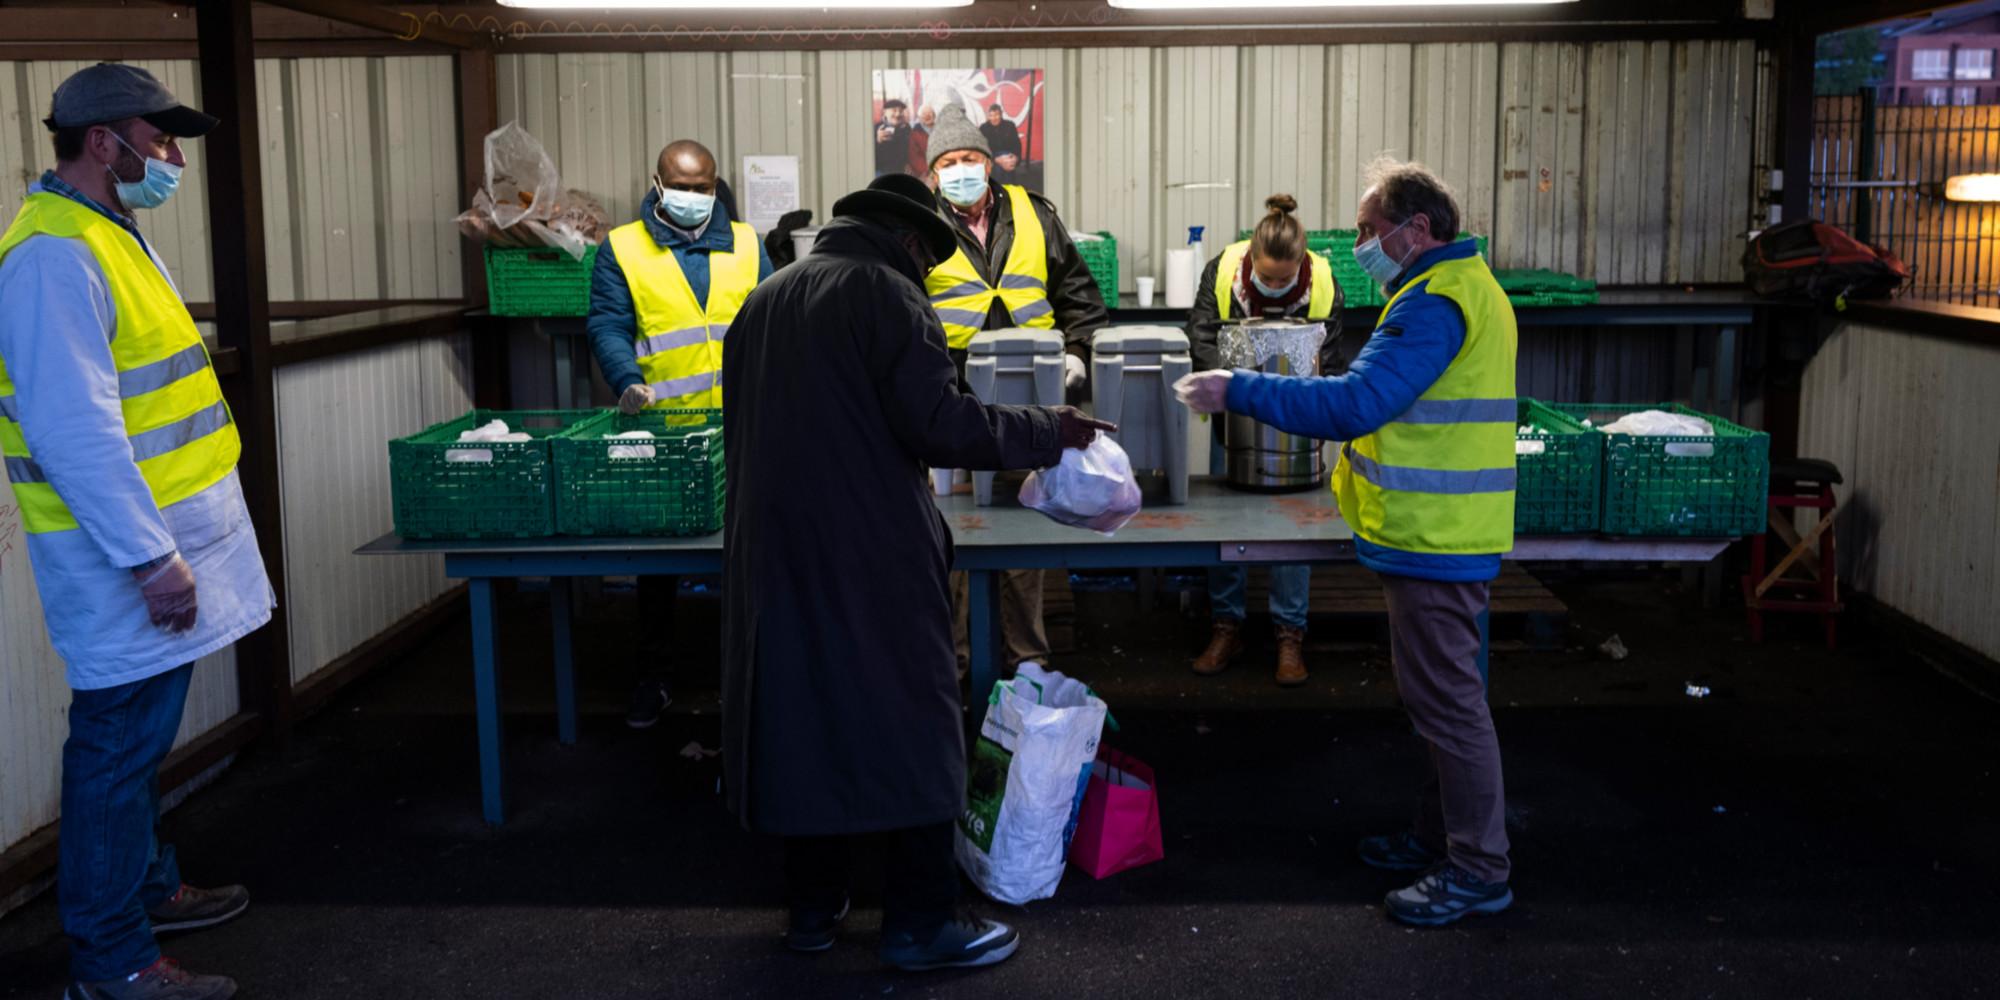 Covid : en attendant le vaccin, les associations manquent cruellement de bénévoles séniors